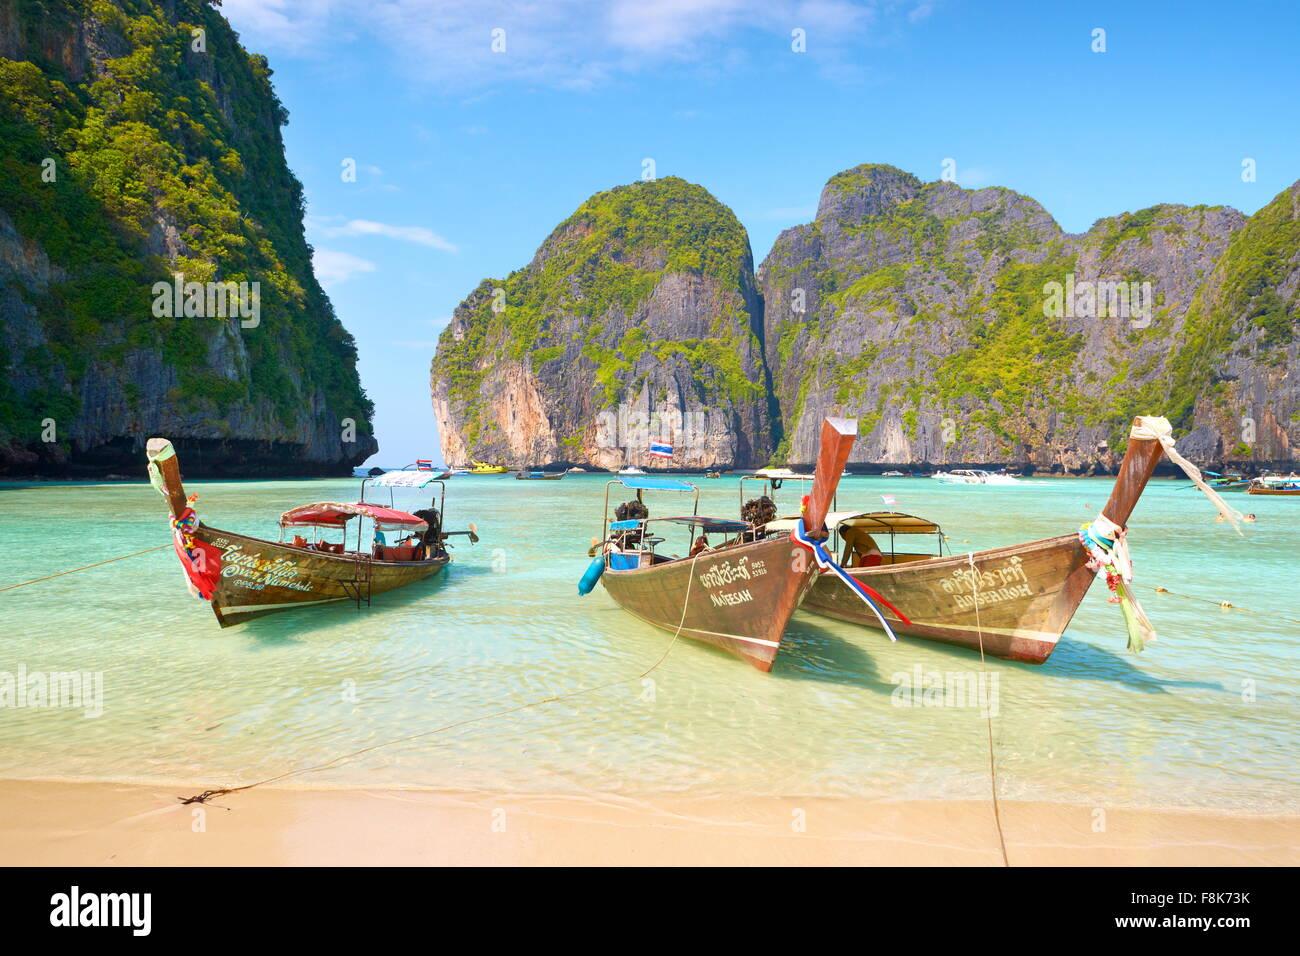 Thailand tropical beach, Maya Bay, Phi Phi Leh Island, Andaman Sea, Asia - Stock Image